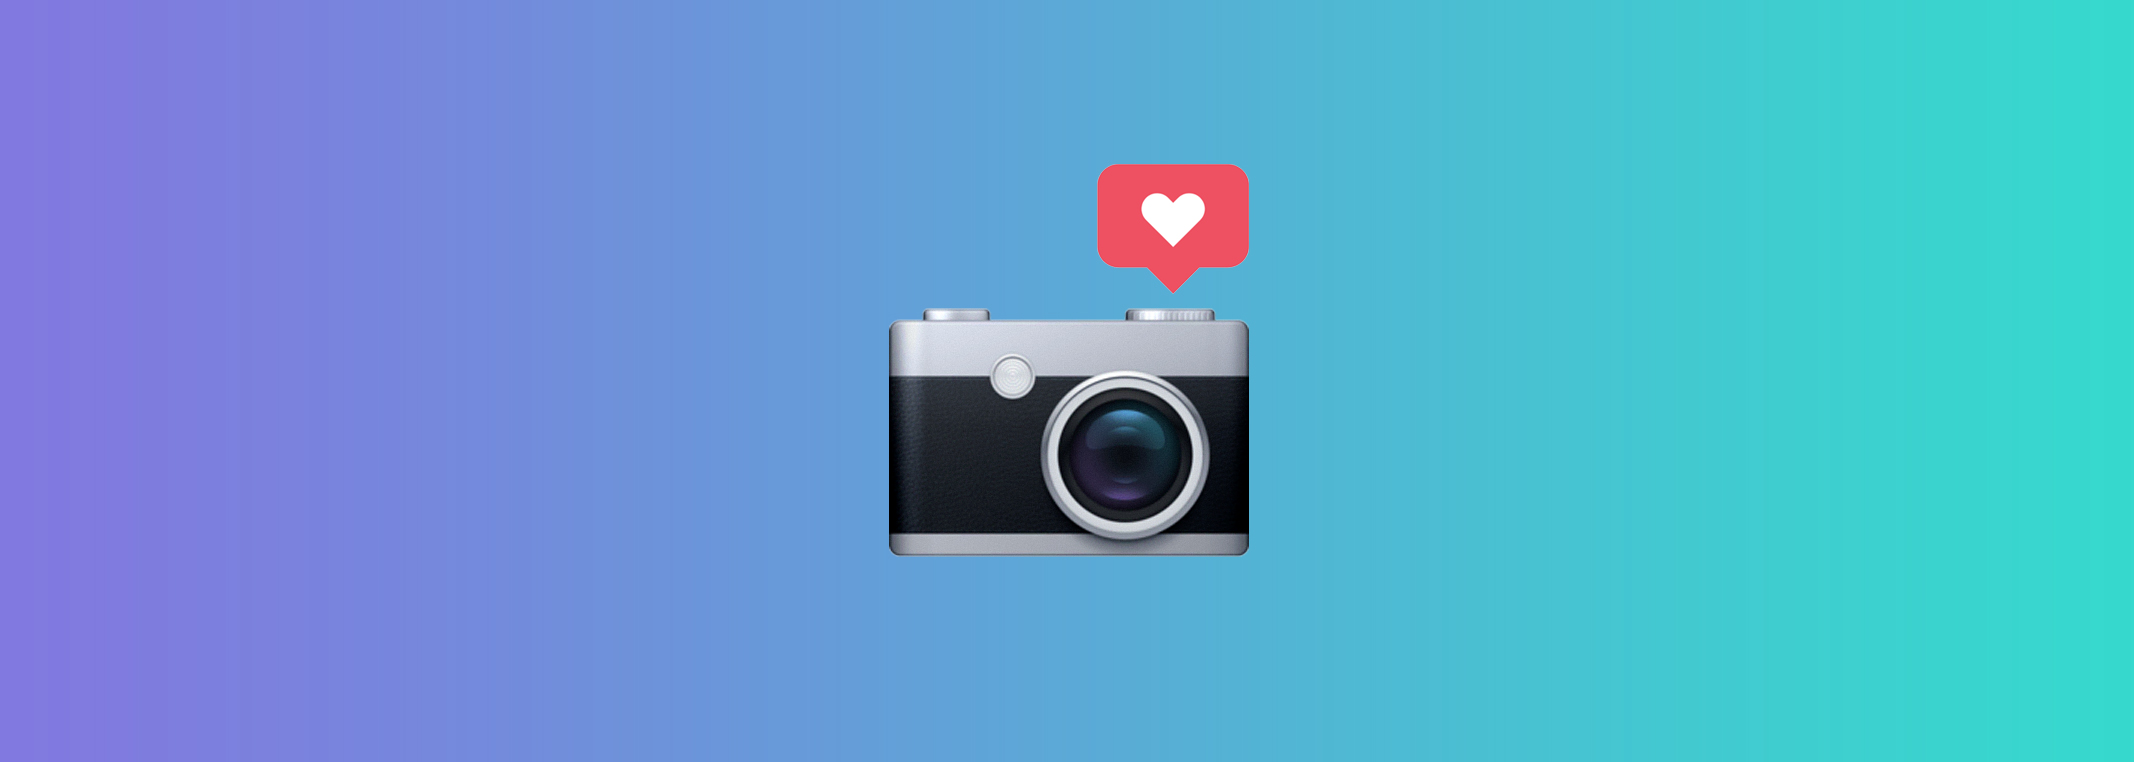 Camera showing social media likes